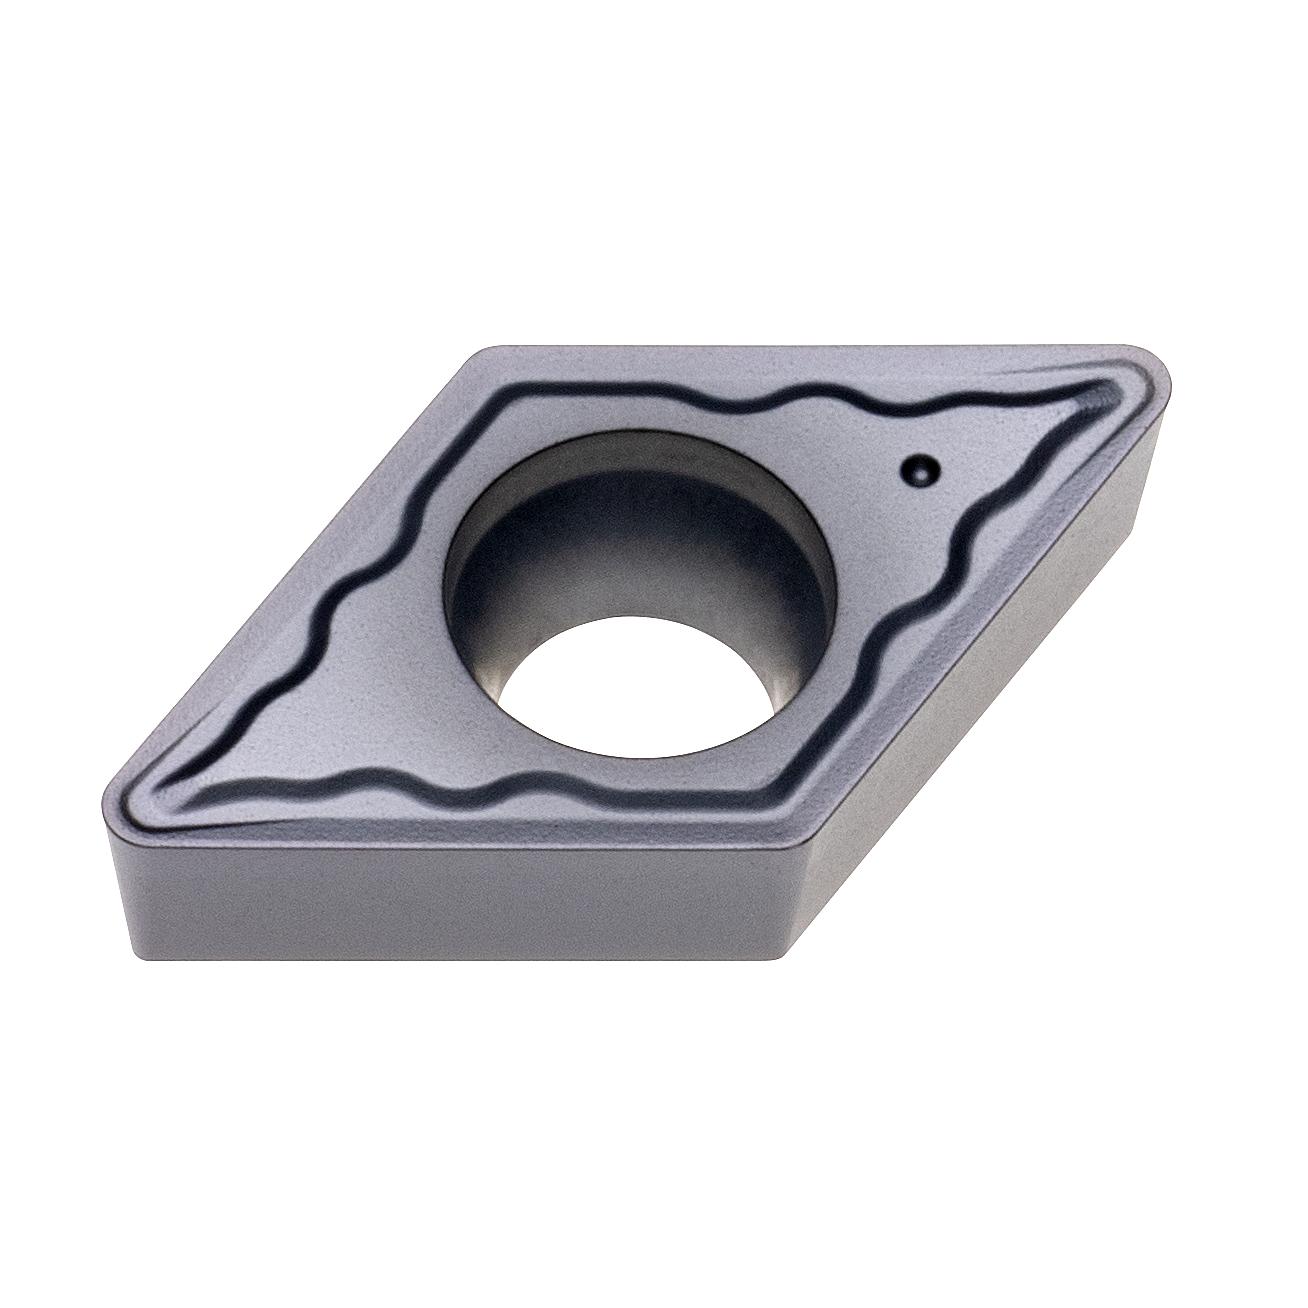 DCGT 11T302 - PM3 - PM25CG für Stahl / VA